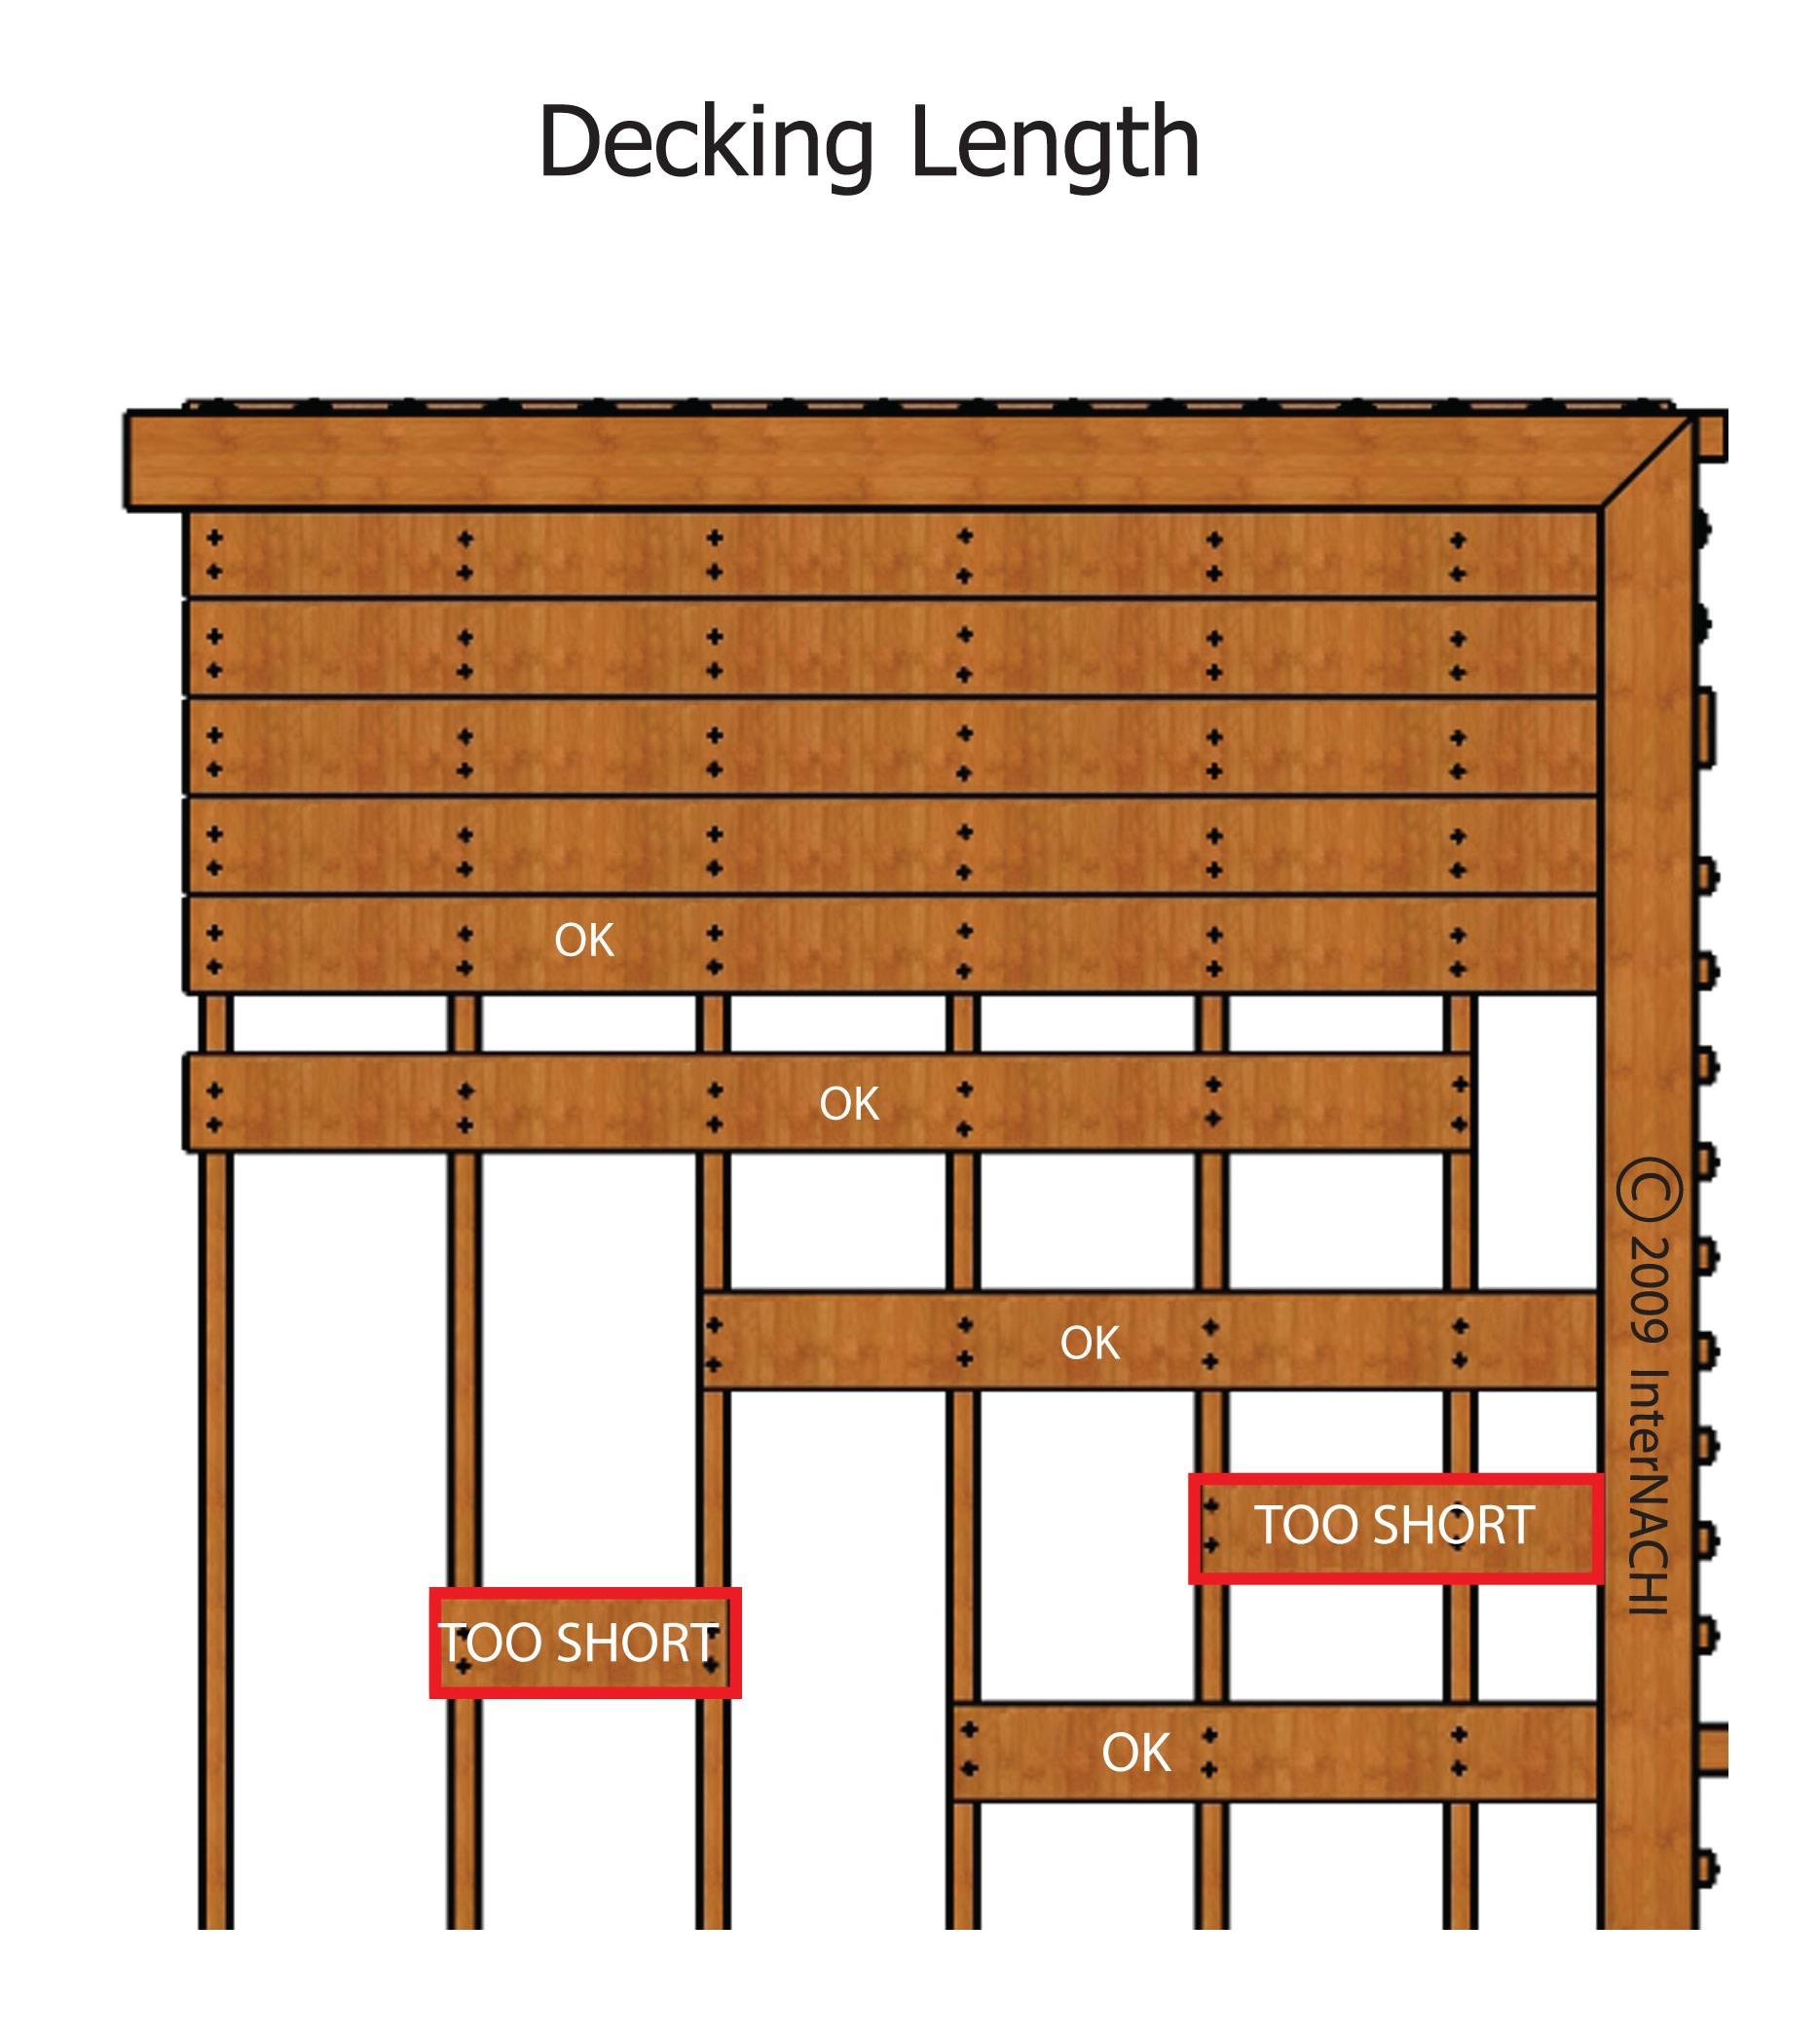 Decking should span 4 joists.